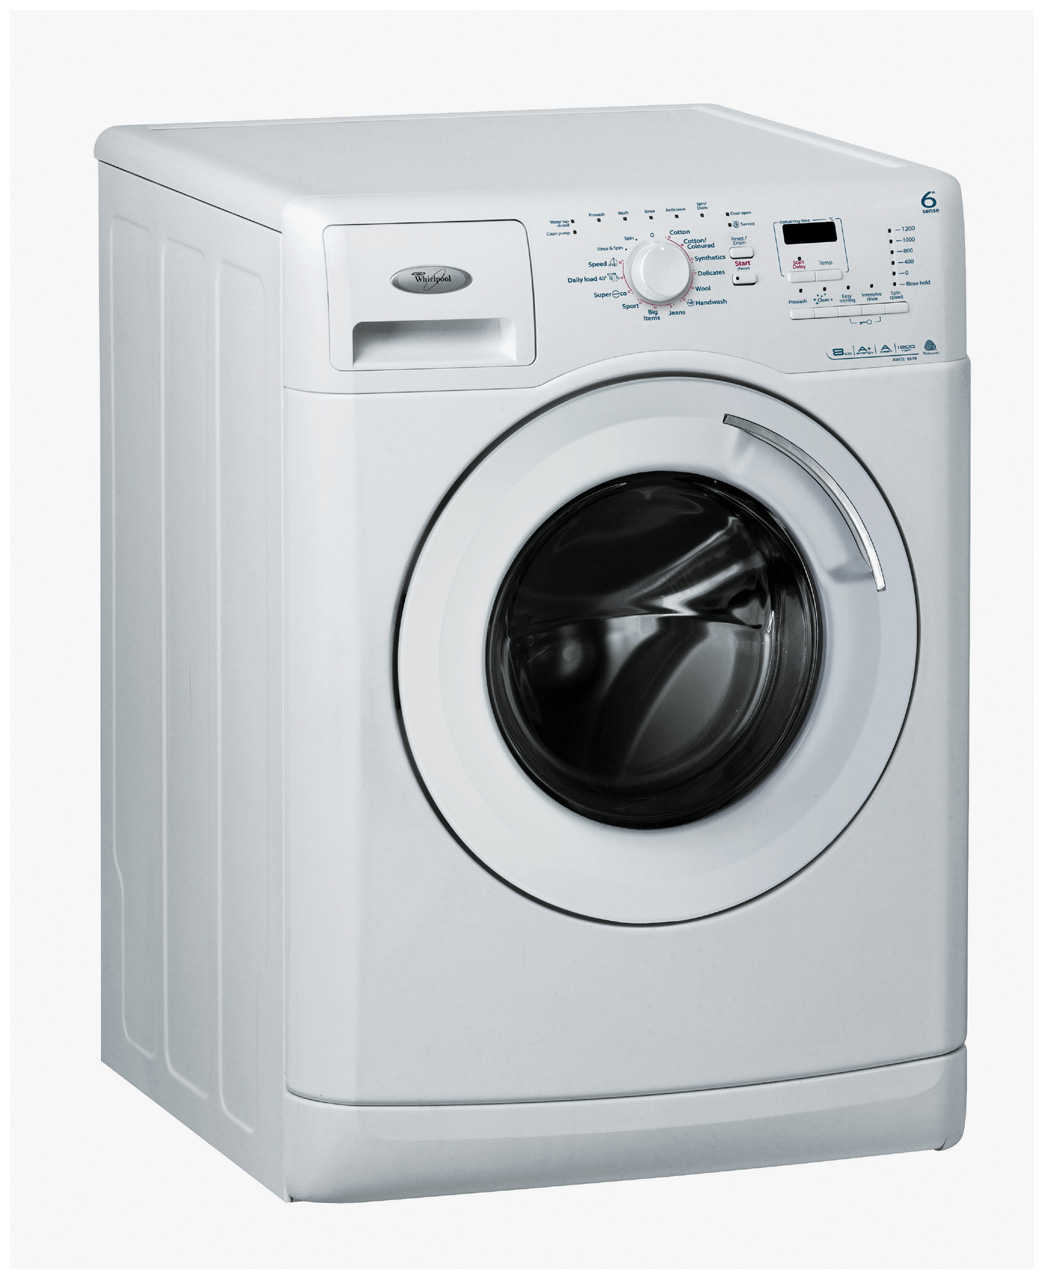 how to service washing machine